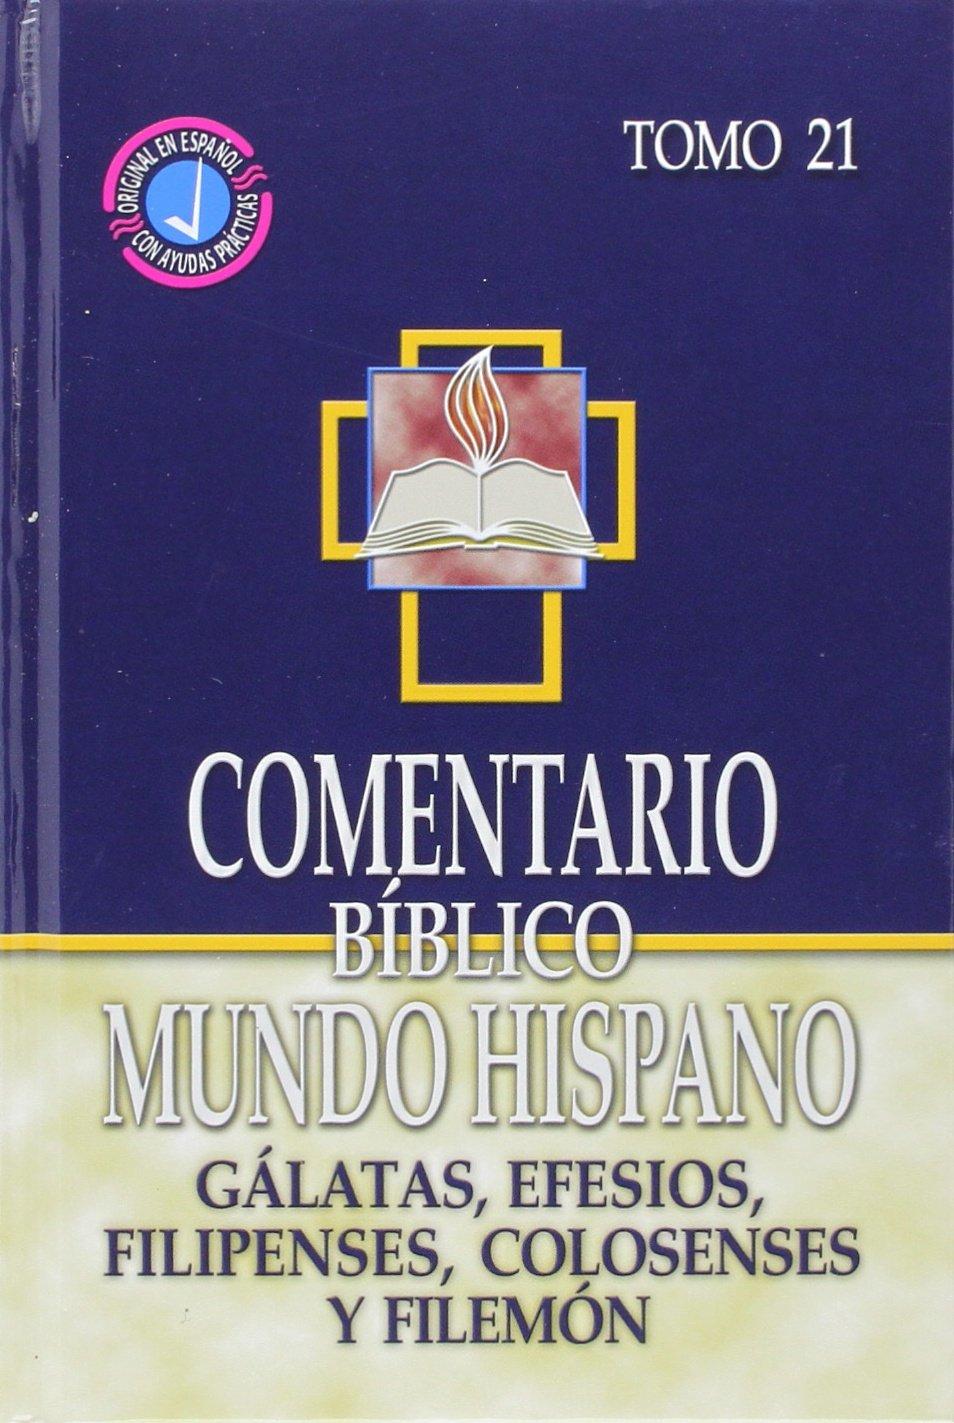 Comentario Biblico Mundo Hispano-Tomo 21- Galatas, Efesios, Filipenses, Colosenses y Filemon (Spanish Edition) PDF